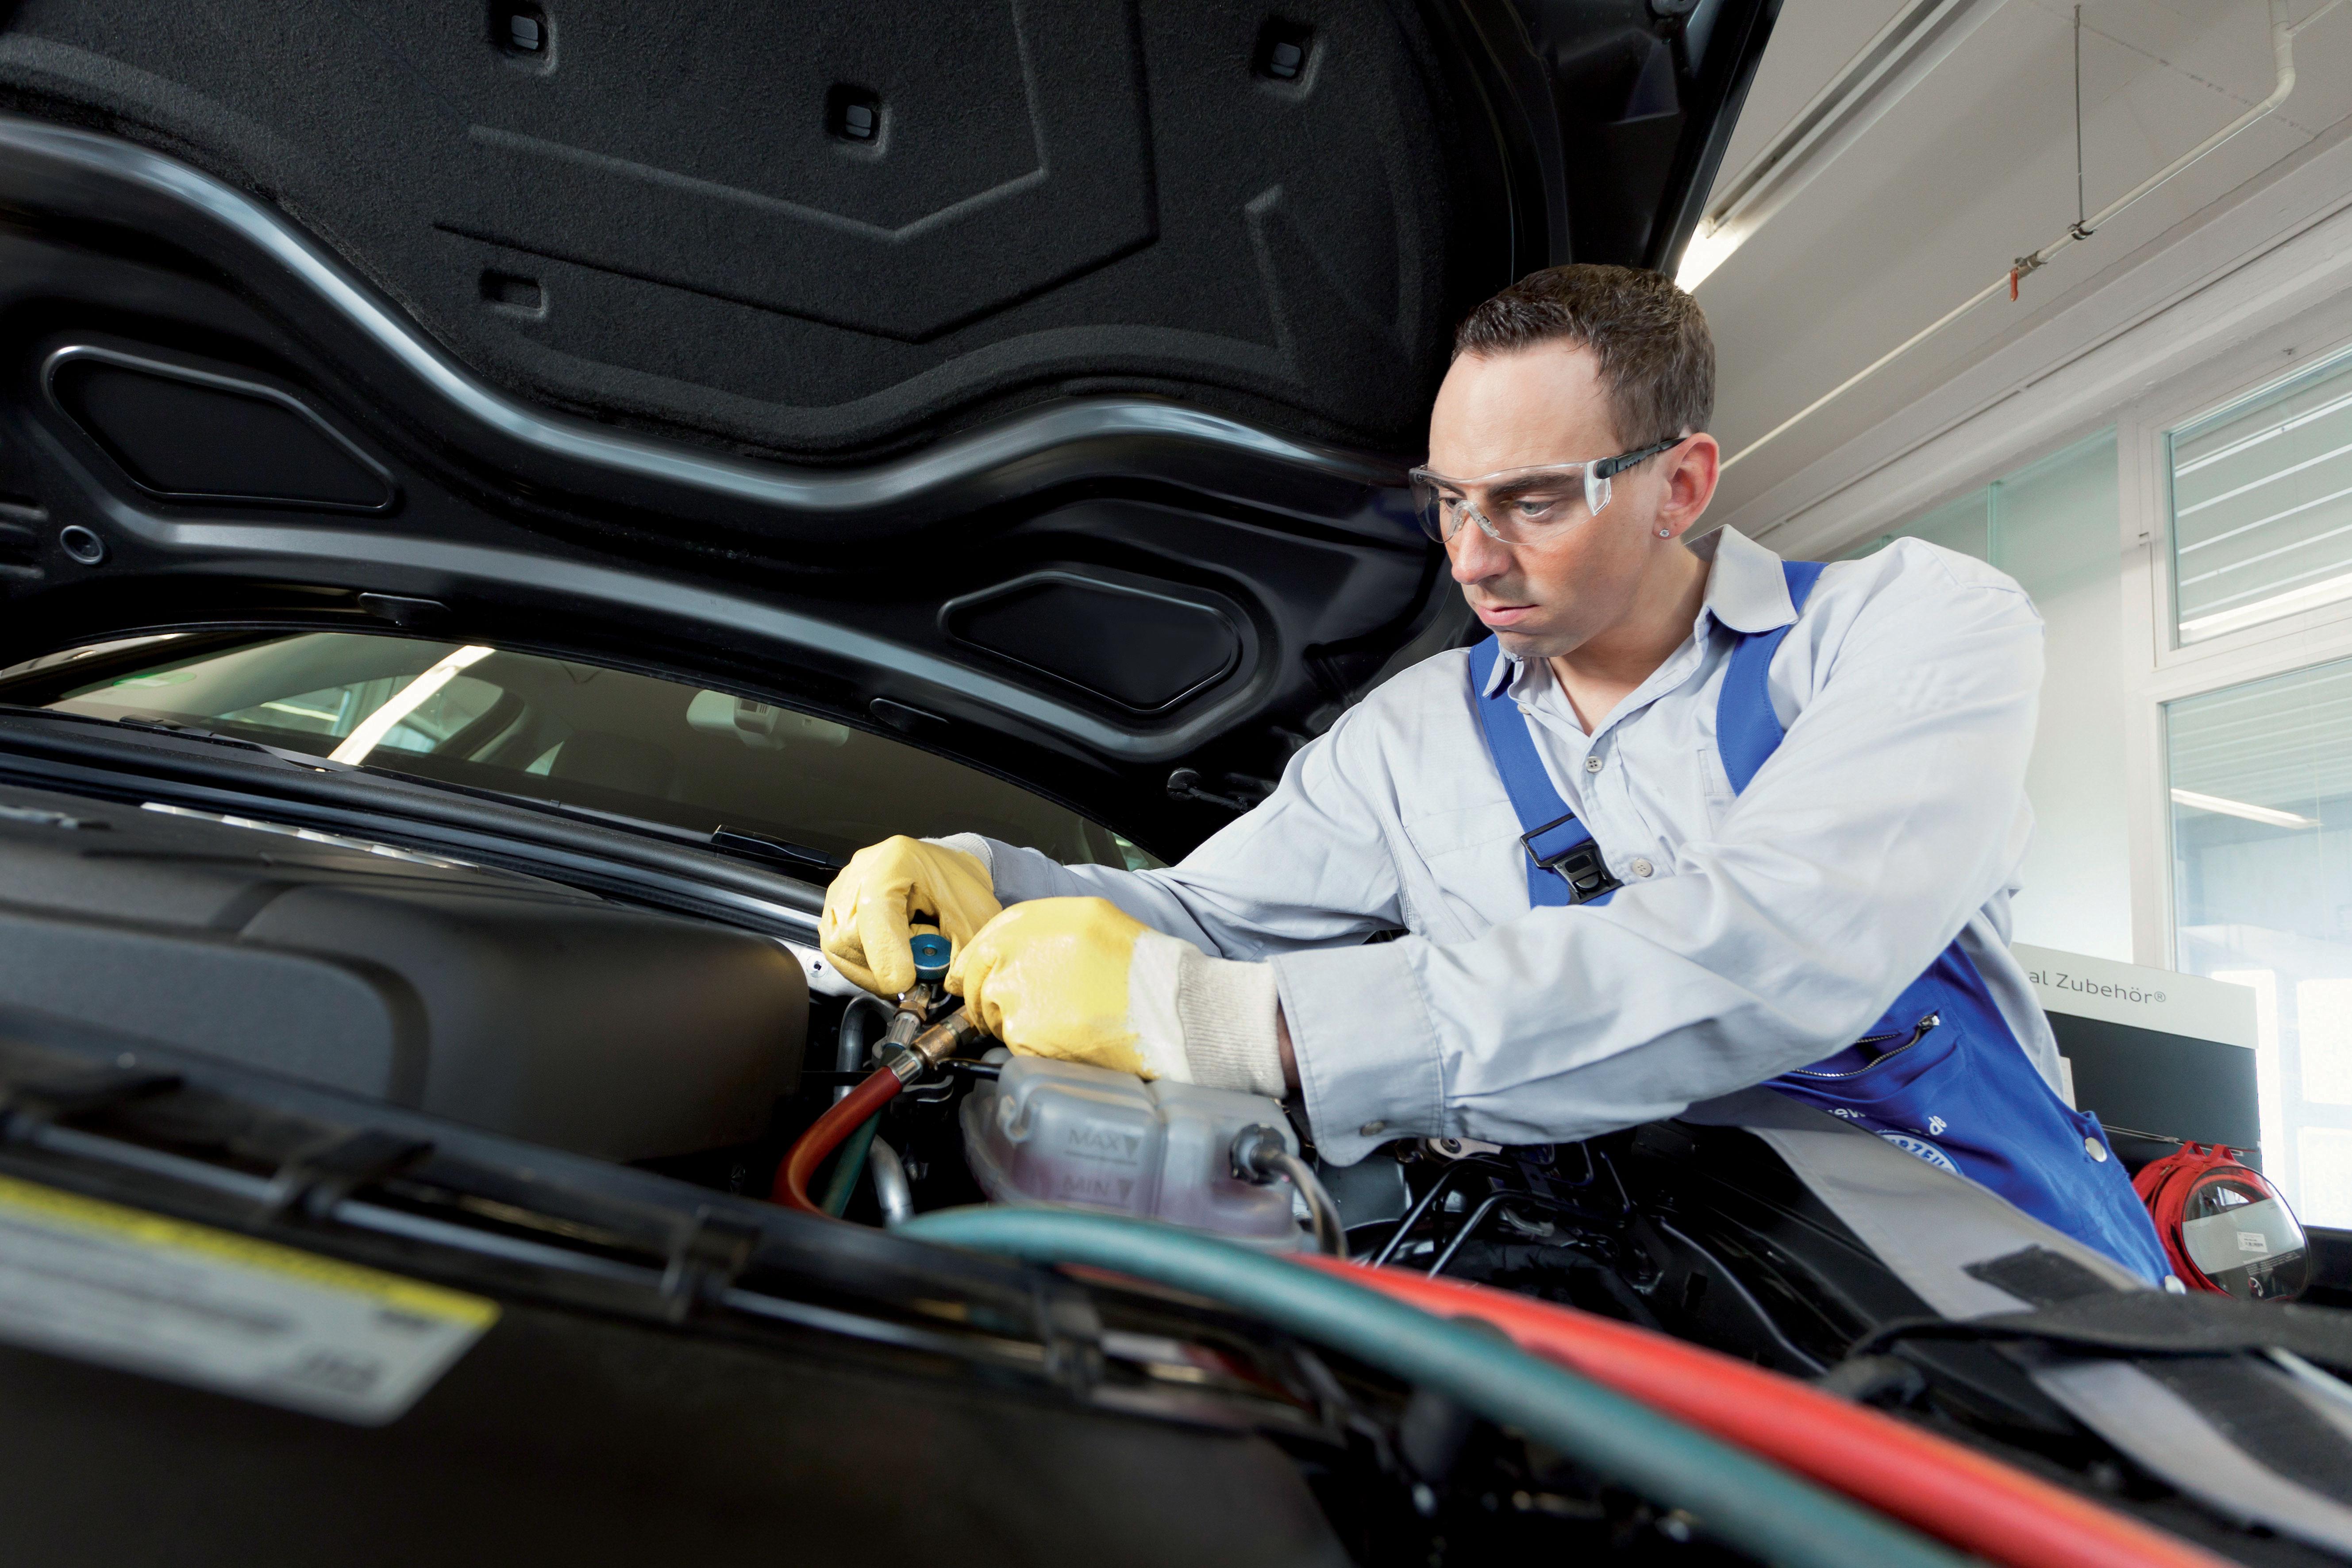 Klimaanlagen in Kraftfahrzeugen (Grundlehrgang)